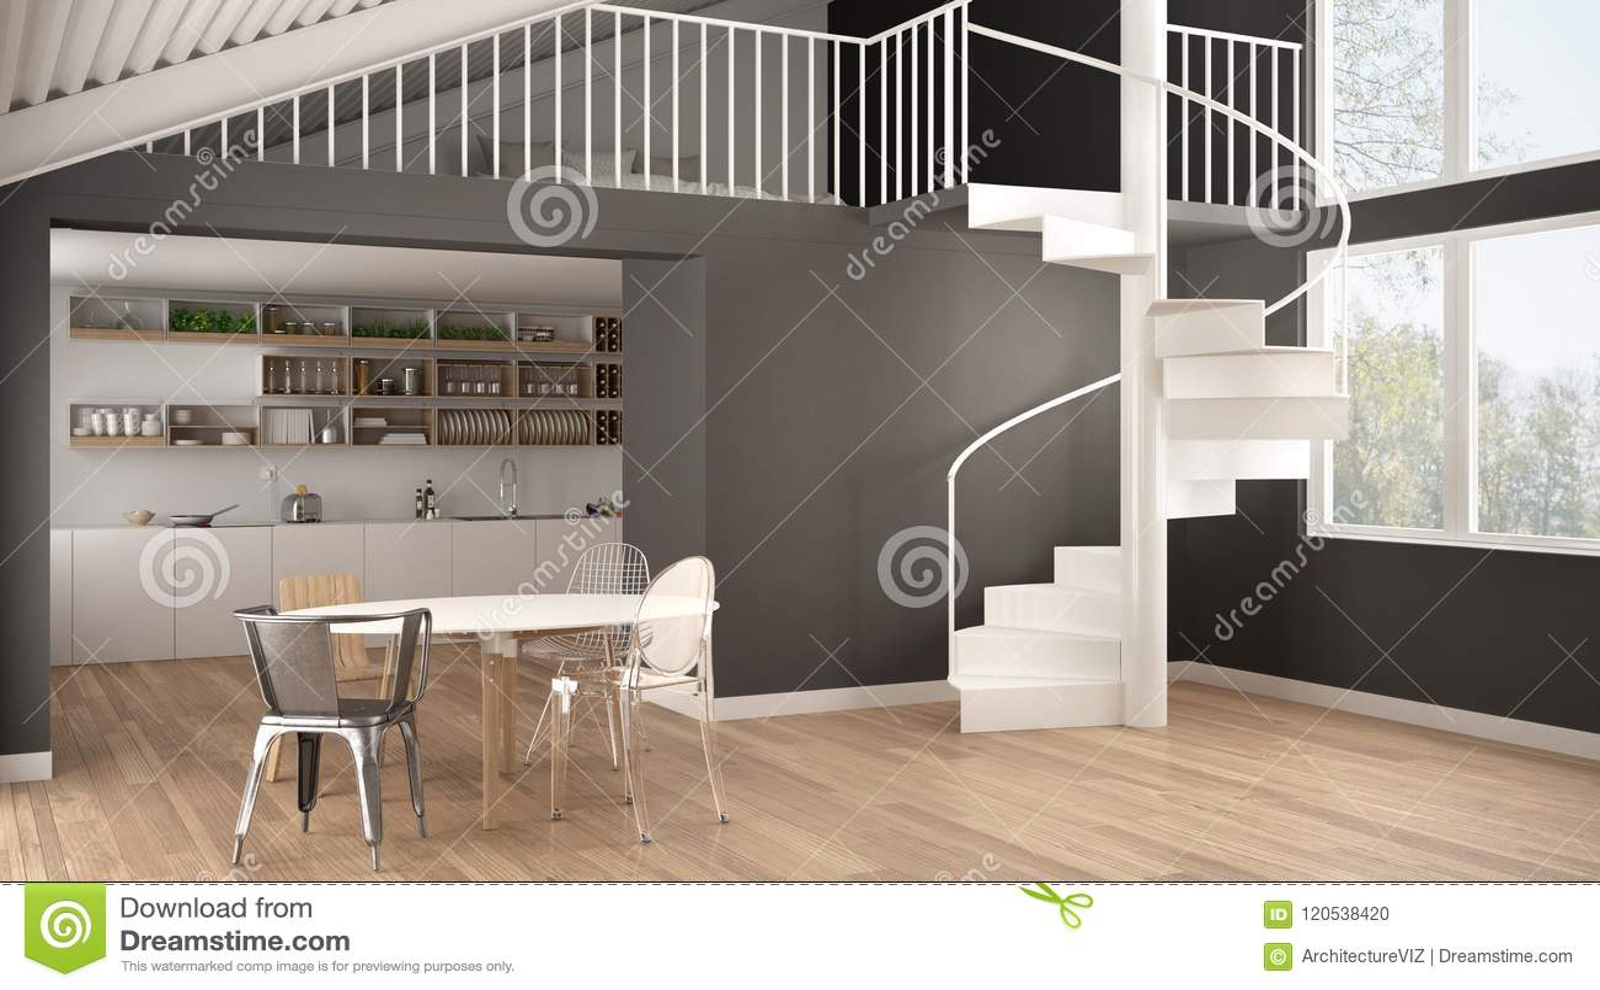 Minimalist White And Gray Kitchen With Mezzanine And Modern Spiral ...